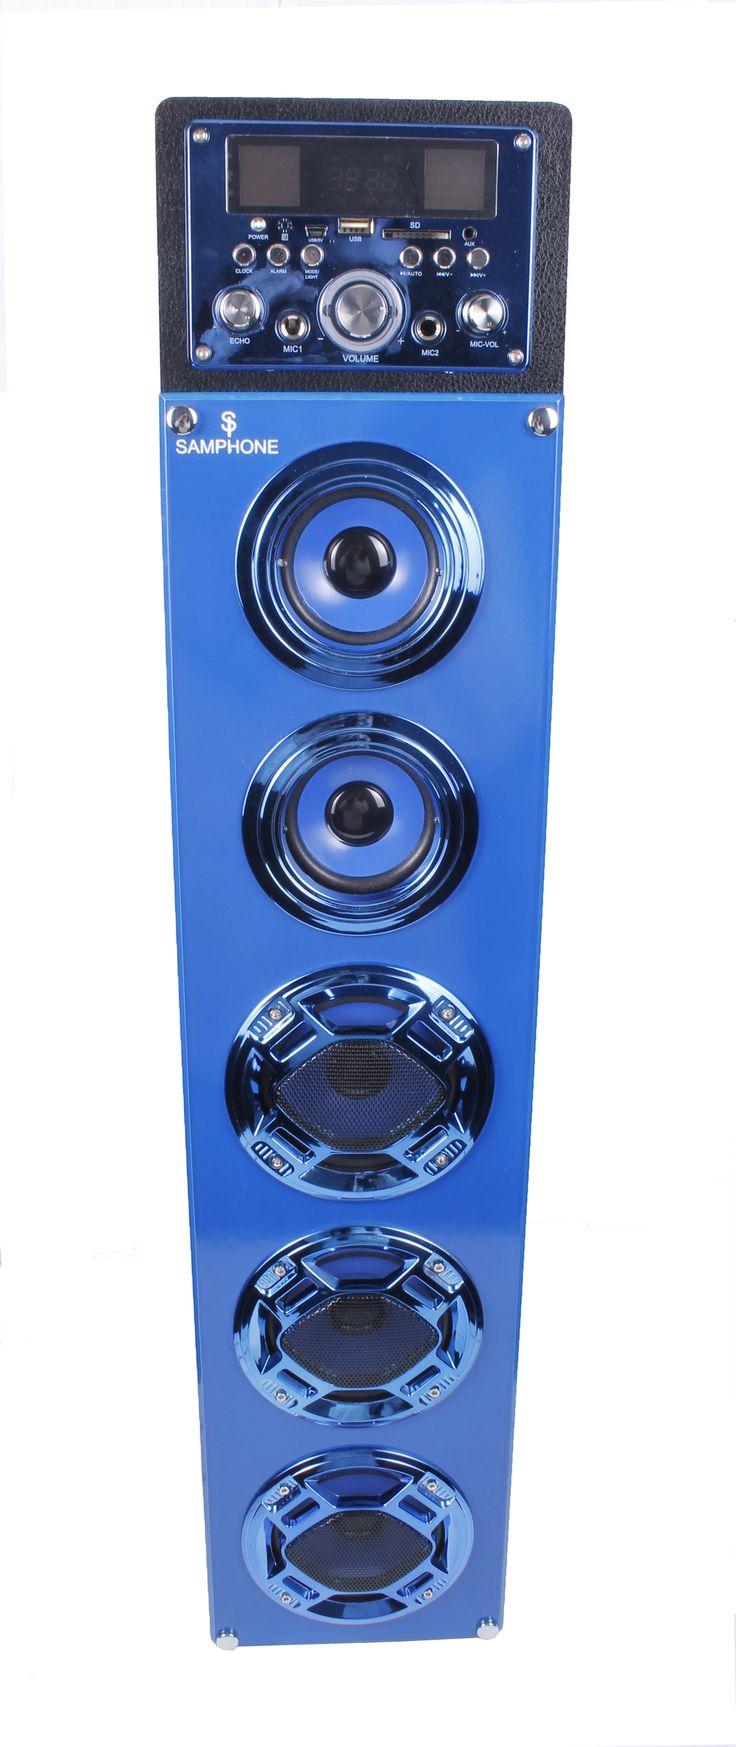 Altavoz Portatil Bluetooth Karaoke Micro Incluído NFC Alarma USB Micro SD -   Accesorios y Teléfonos Móviles    ALTAVOZ PORTATIL BLUETOOTH Karaoke Micro Incluido NFC Alarma USB Micro SD      ALTAVOZ PORTATIL BLUETOOTH Karaoke Micro Incluido NFC Alarma USB Micro SD Altavoz portatil bluetooth karaoke micro incluido NFC alarma USB Micro SD Especificaciones: Podrás esc... - http://buscacomercio.es/producto/altavoz-portatil-bluetooth-karaoke-micro-incluido-nfc-alarma-usb-mic